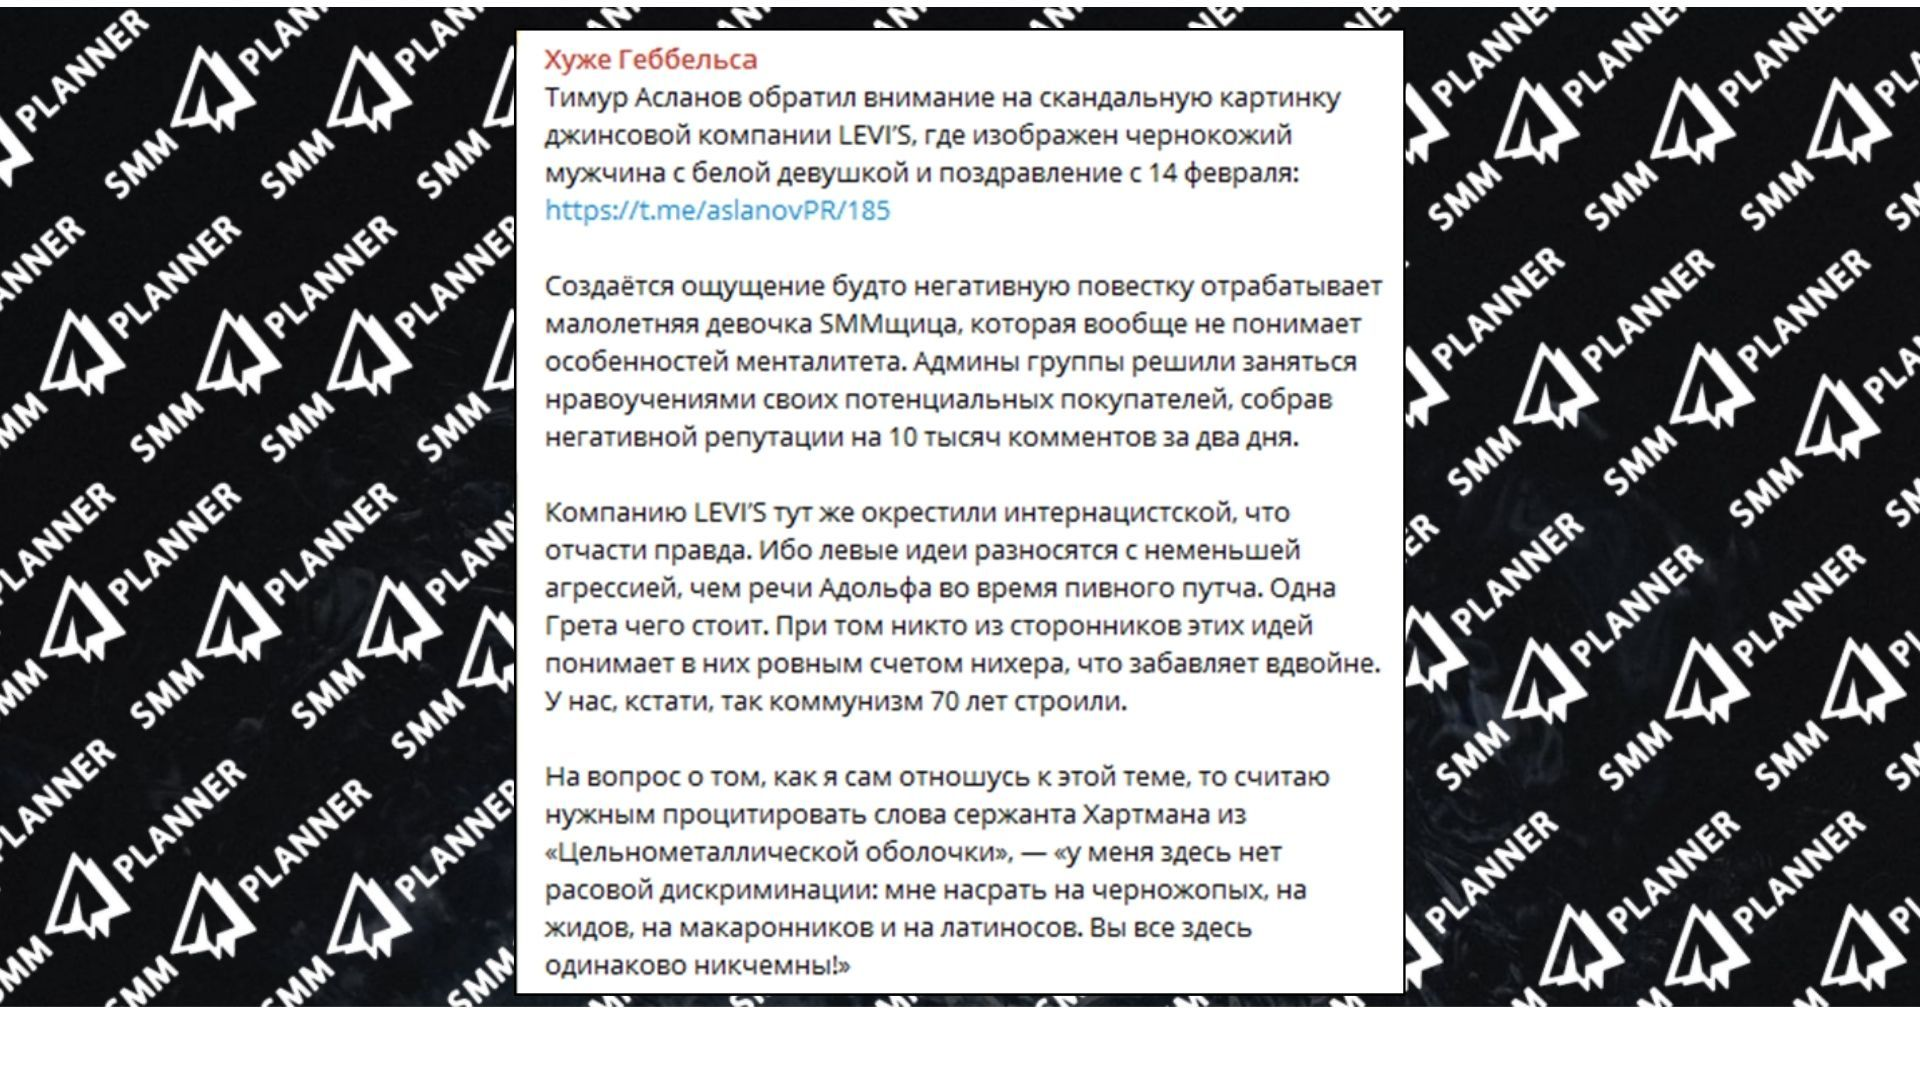 Рекламный пост о канале